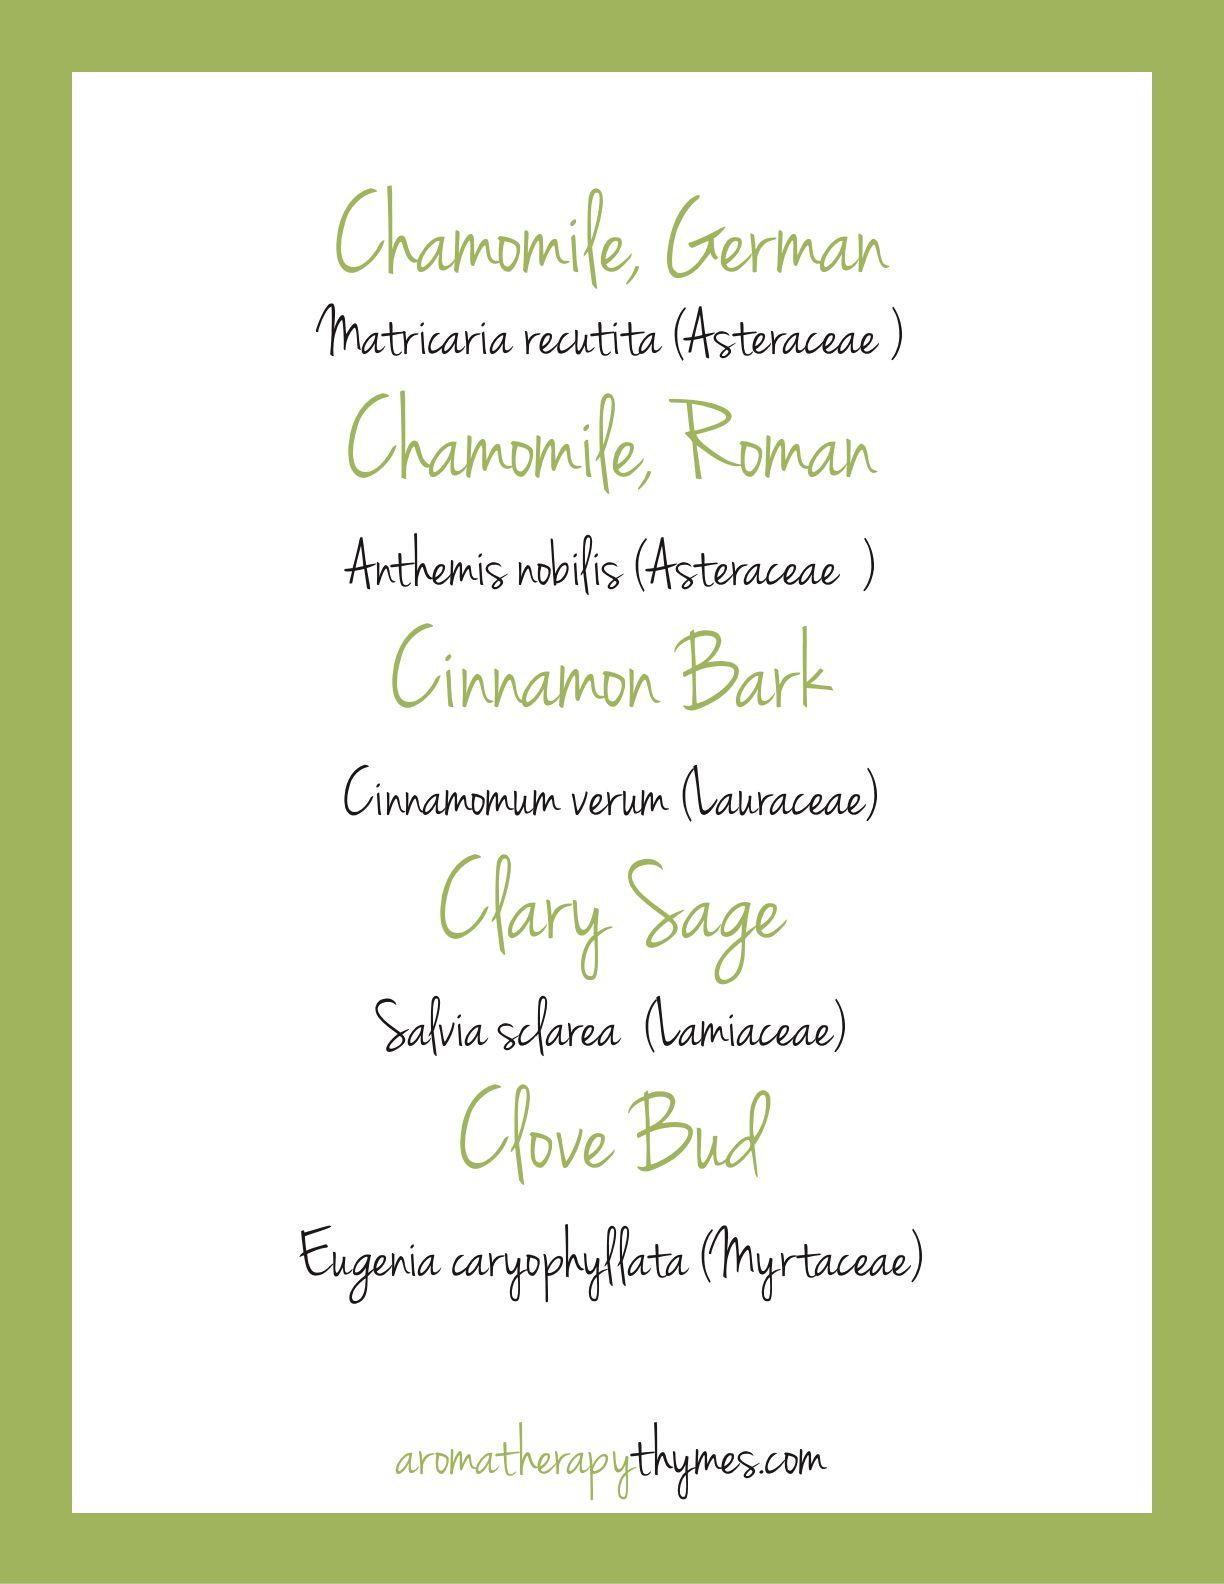 Aromatherapythymesmagazine Aromatherapy Blends Organic Wellness Essential Oil Companies